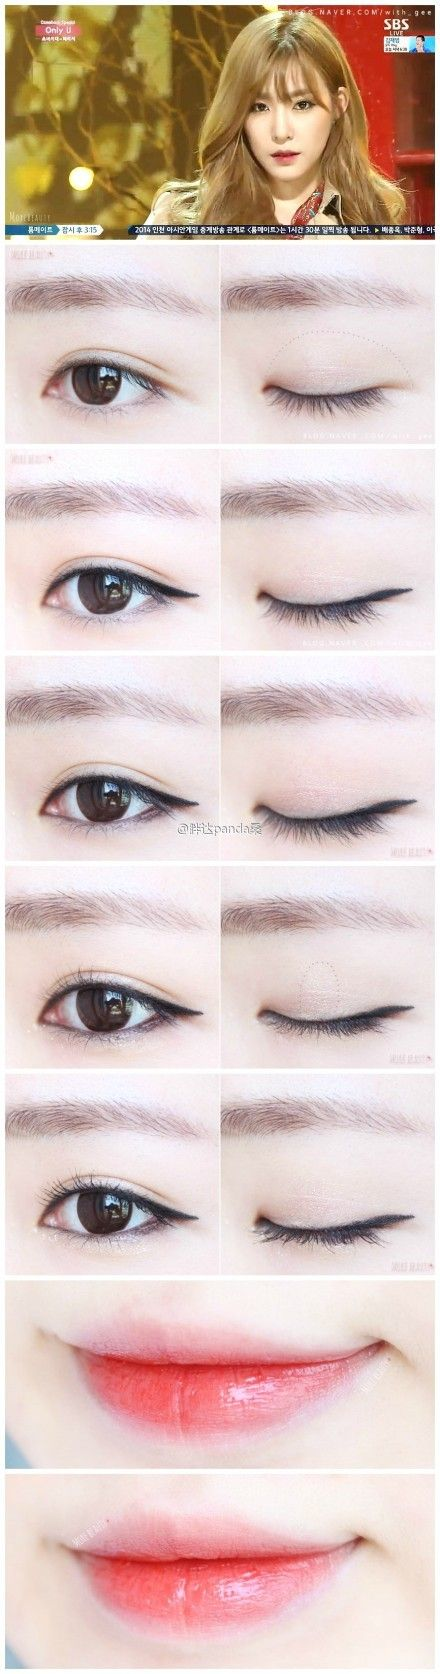 Korean make up #songofcouples #koreanmakeup